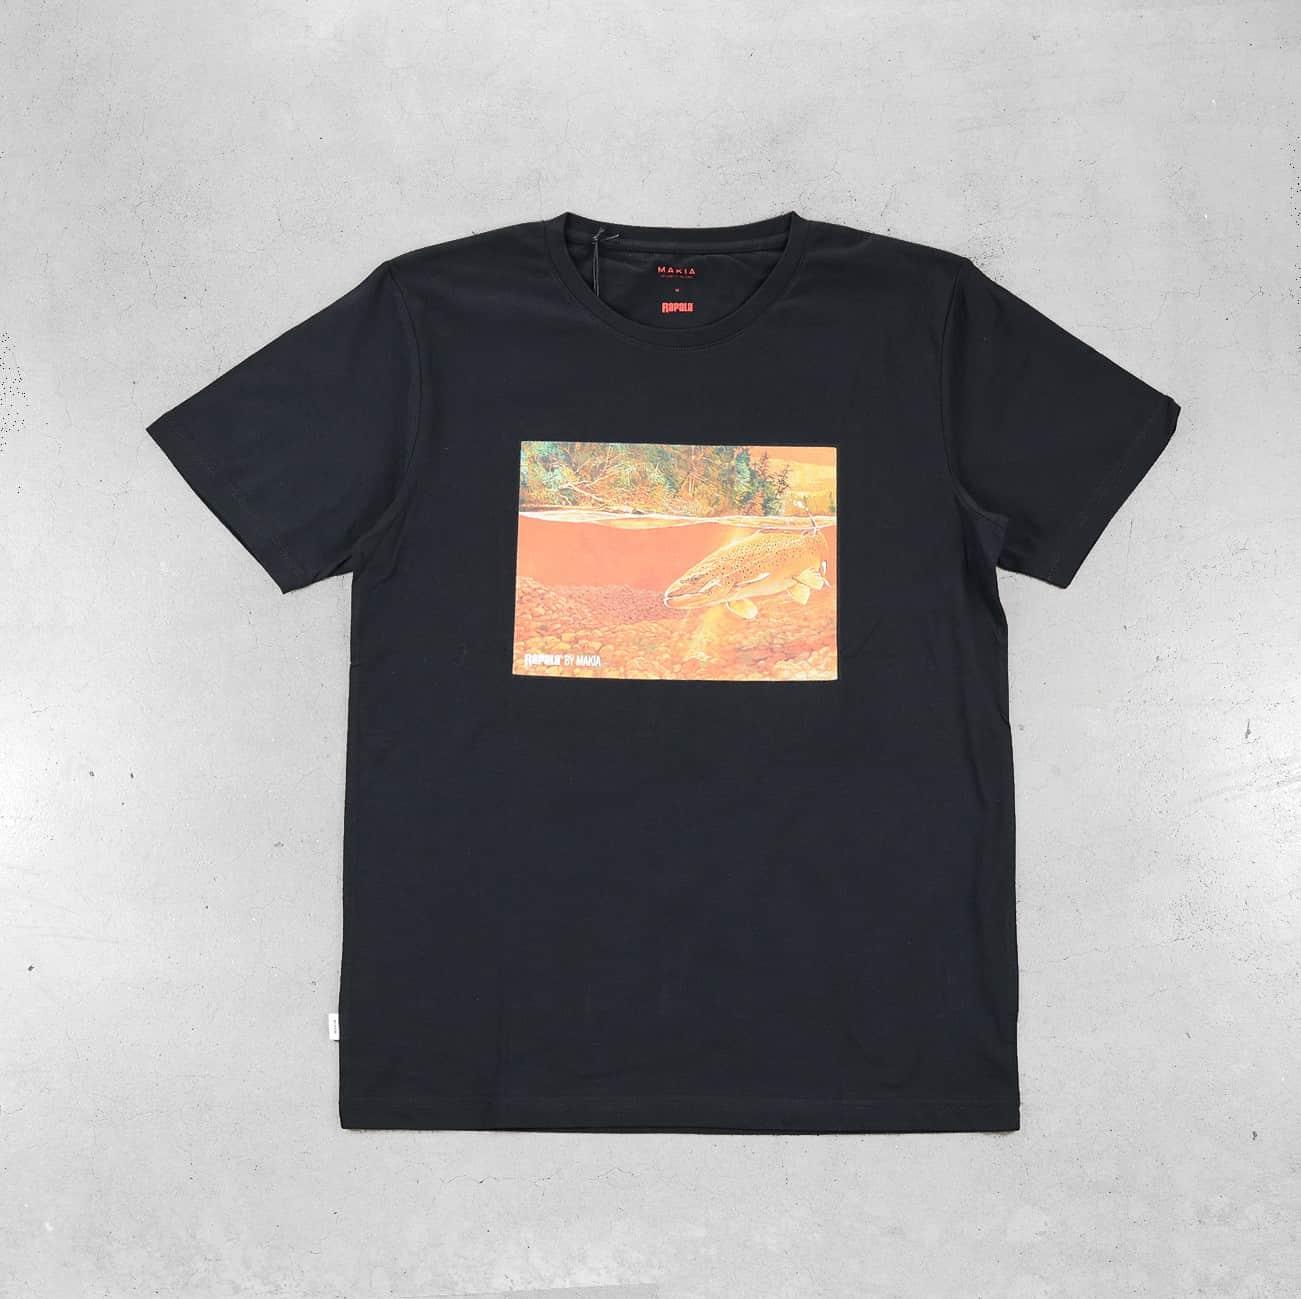 Makia x Rapala Beneath T-Shirt